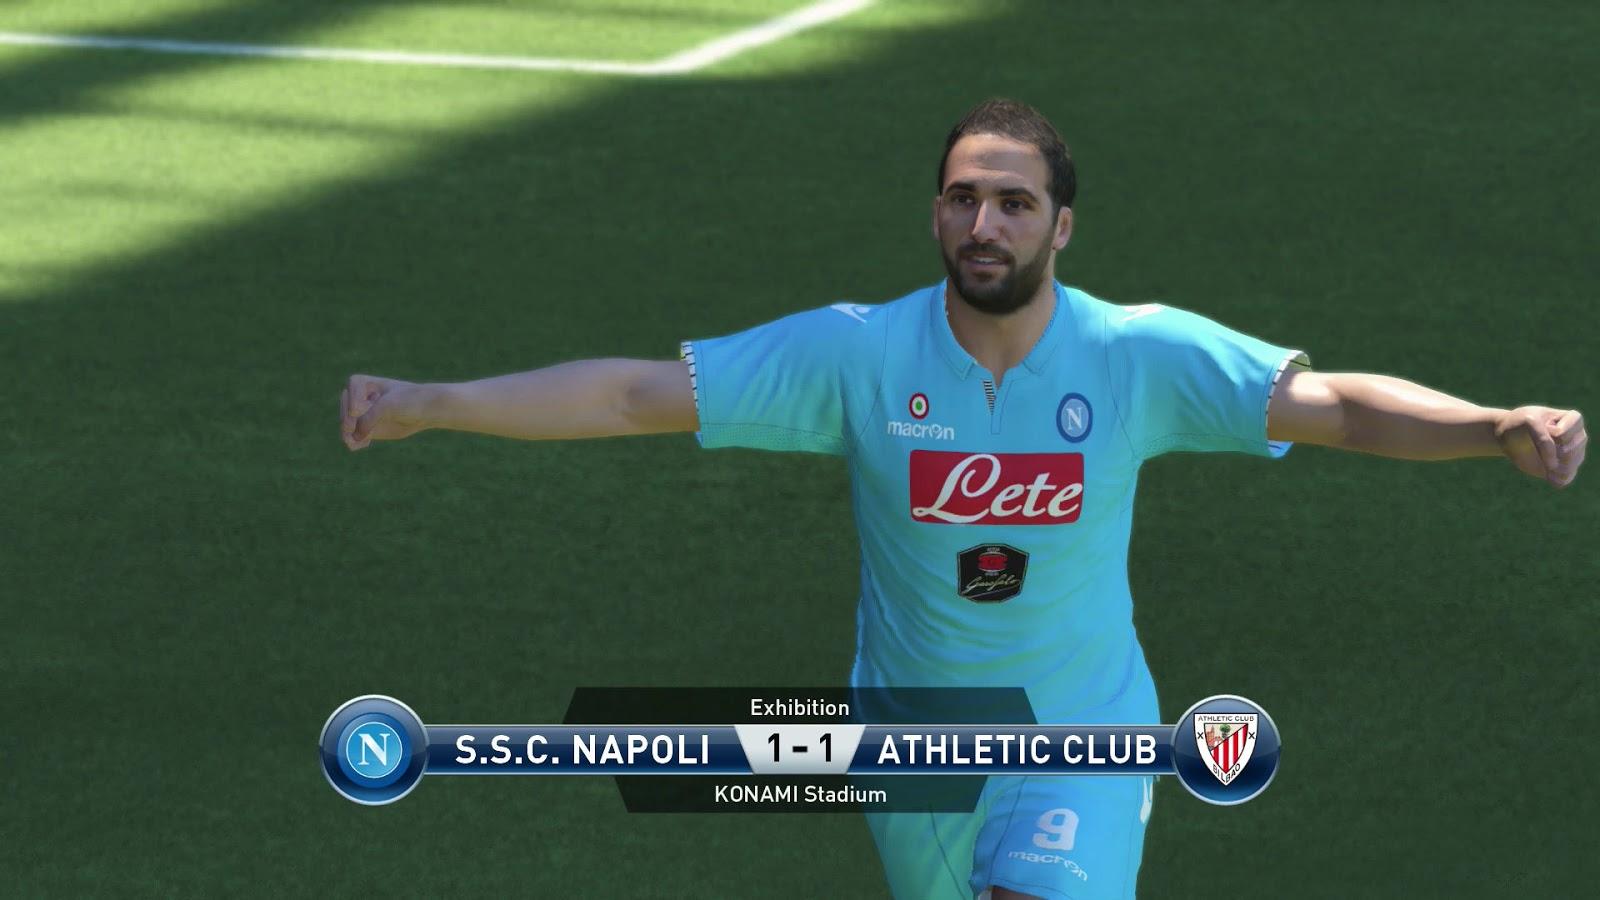 PC] Pro Evolution Soccer 2015 - RELOADED + KaOs RePack pc game ...